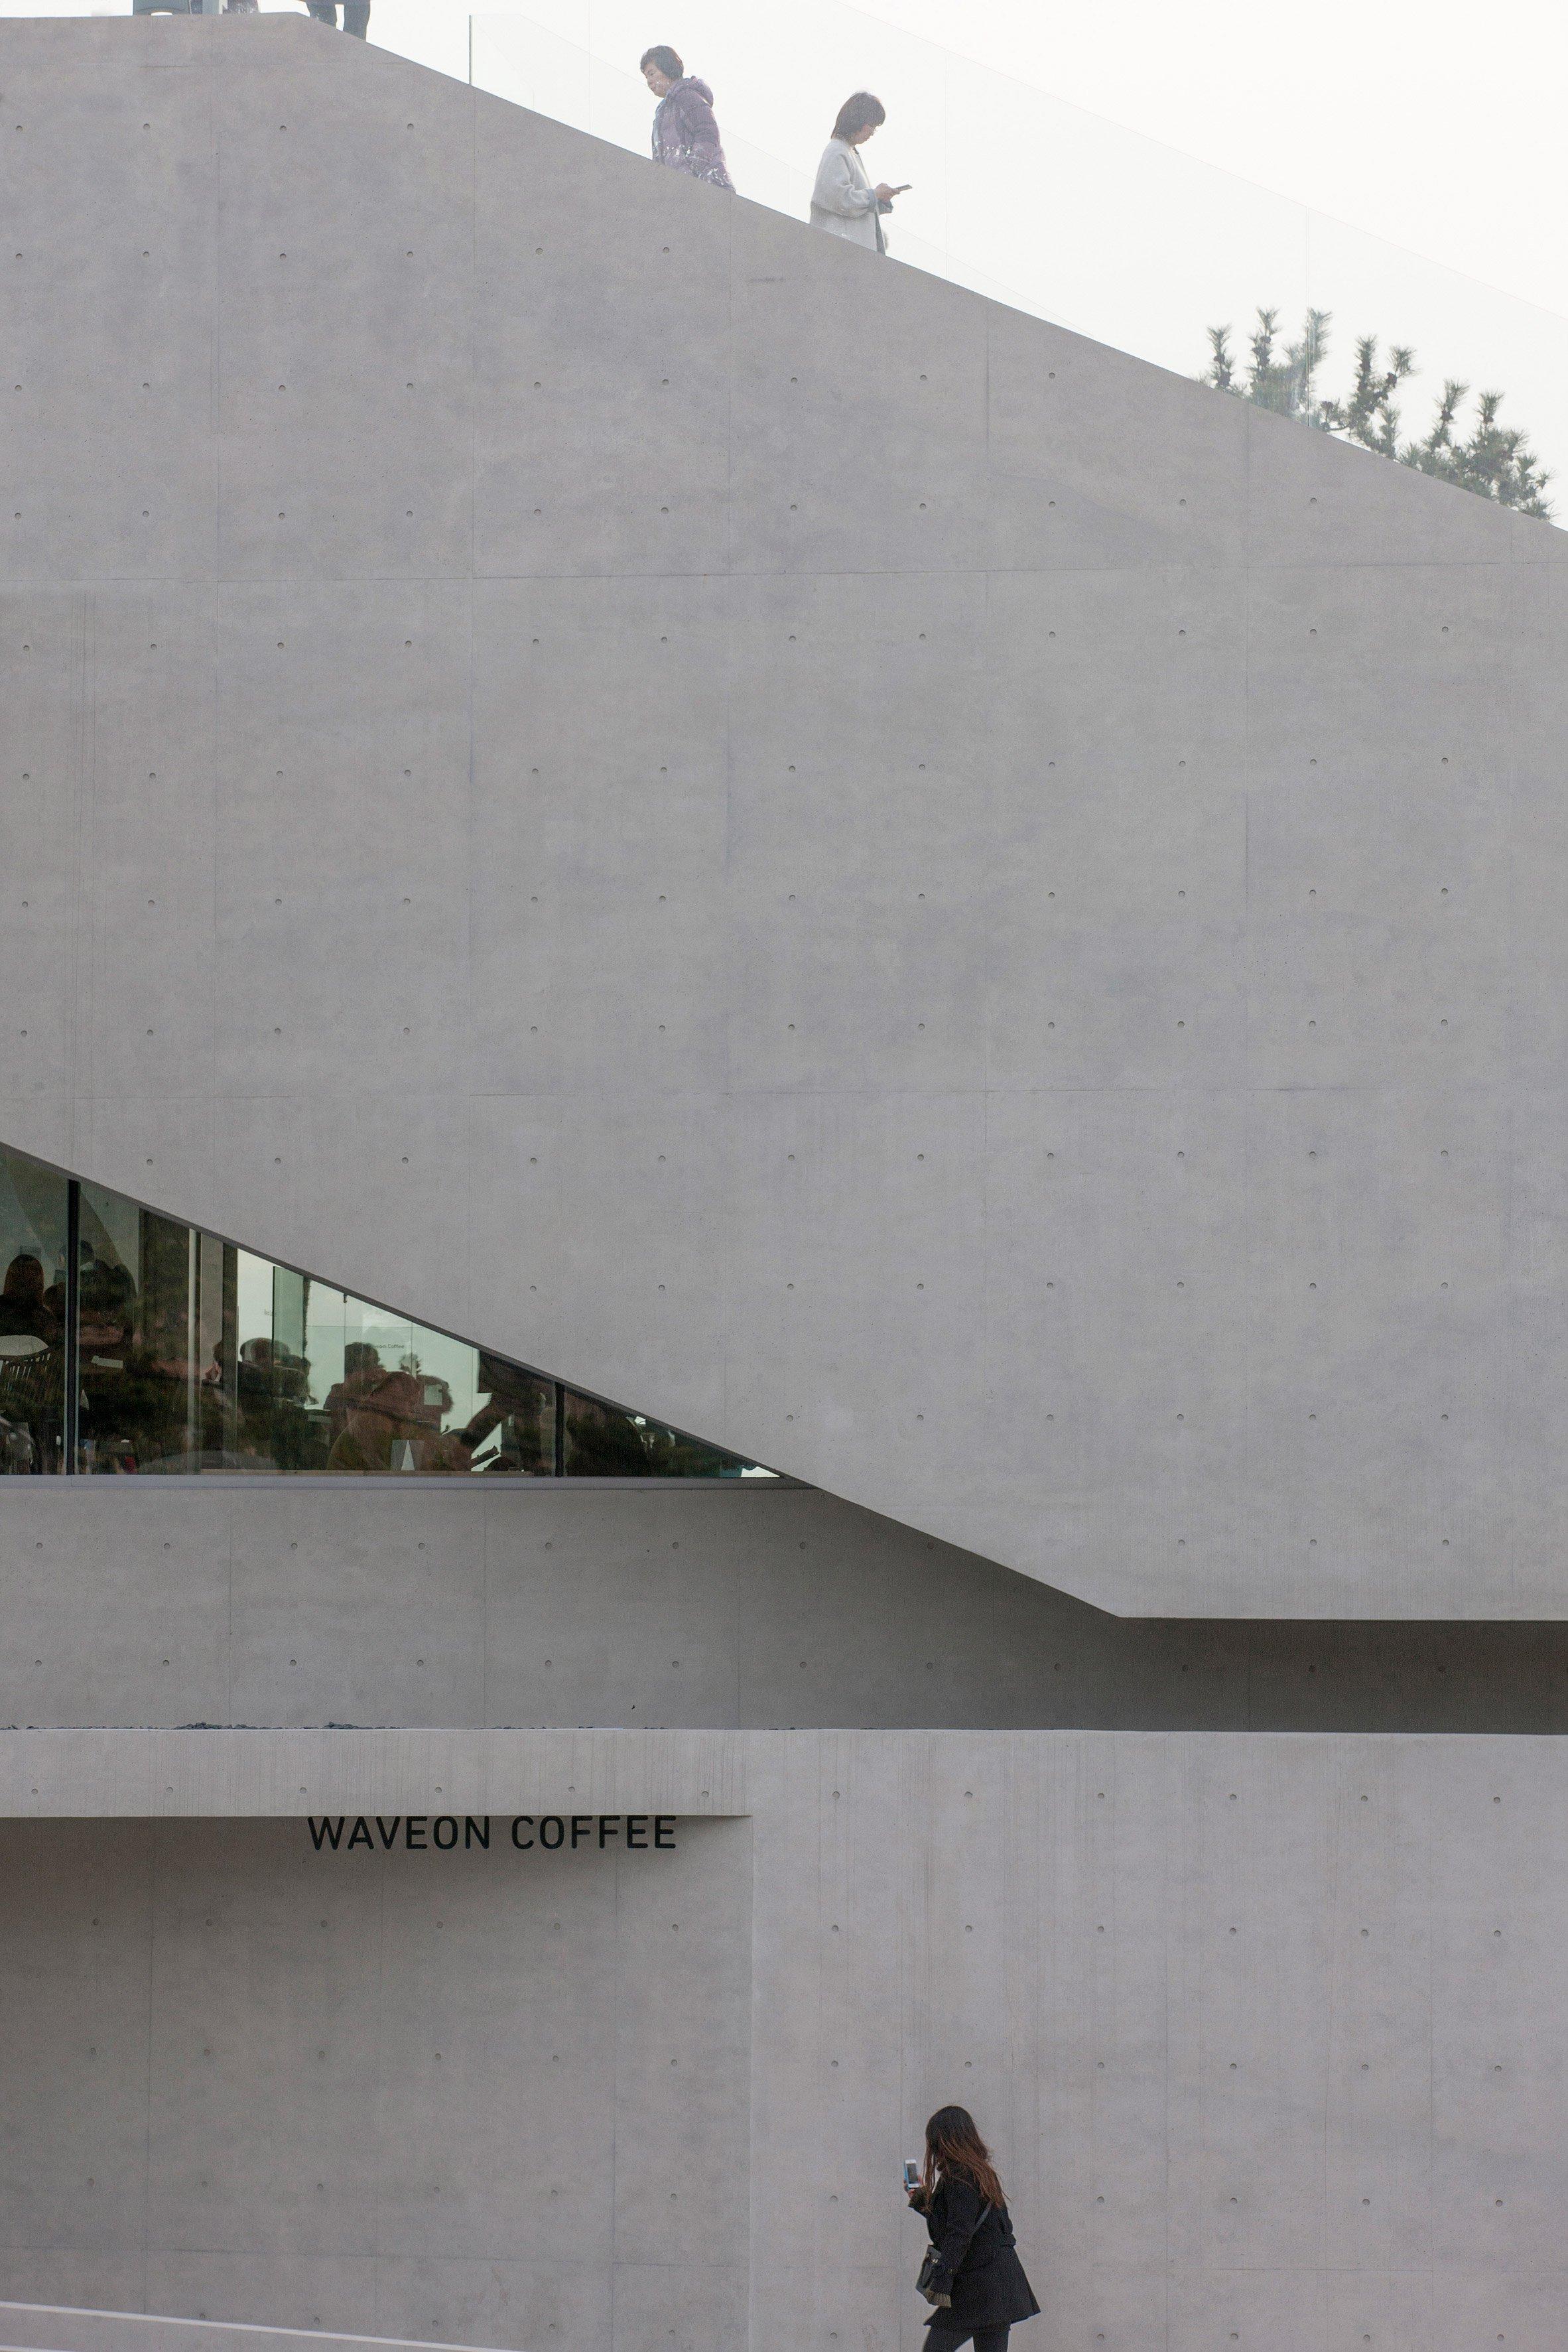 waveon-coffee-11.jpg